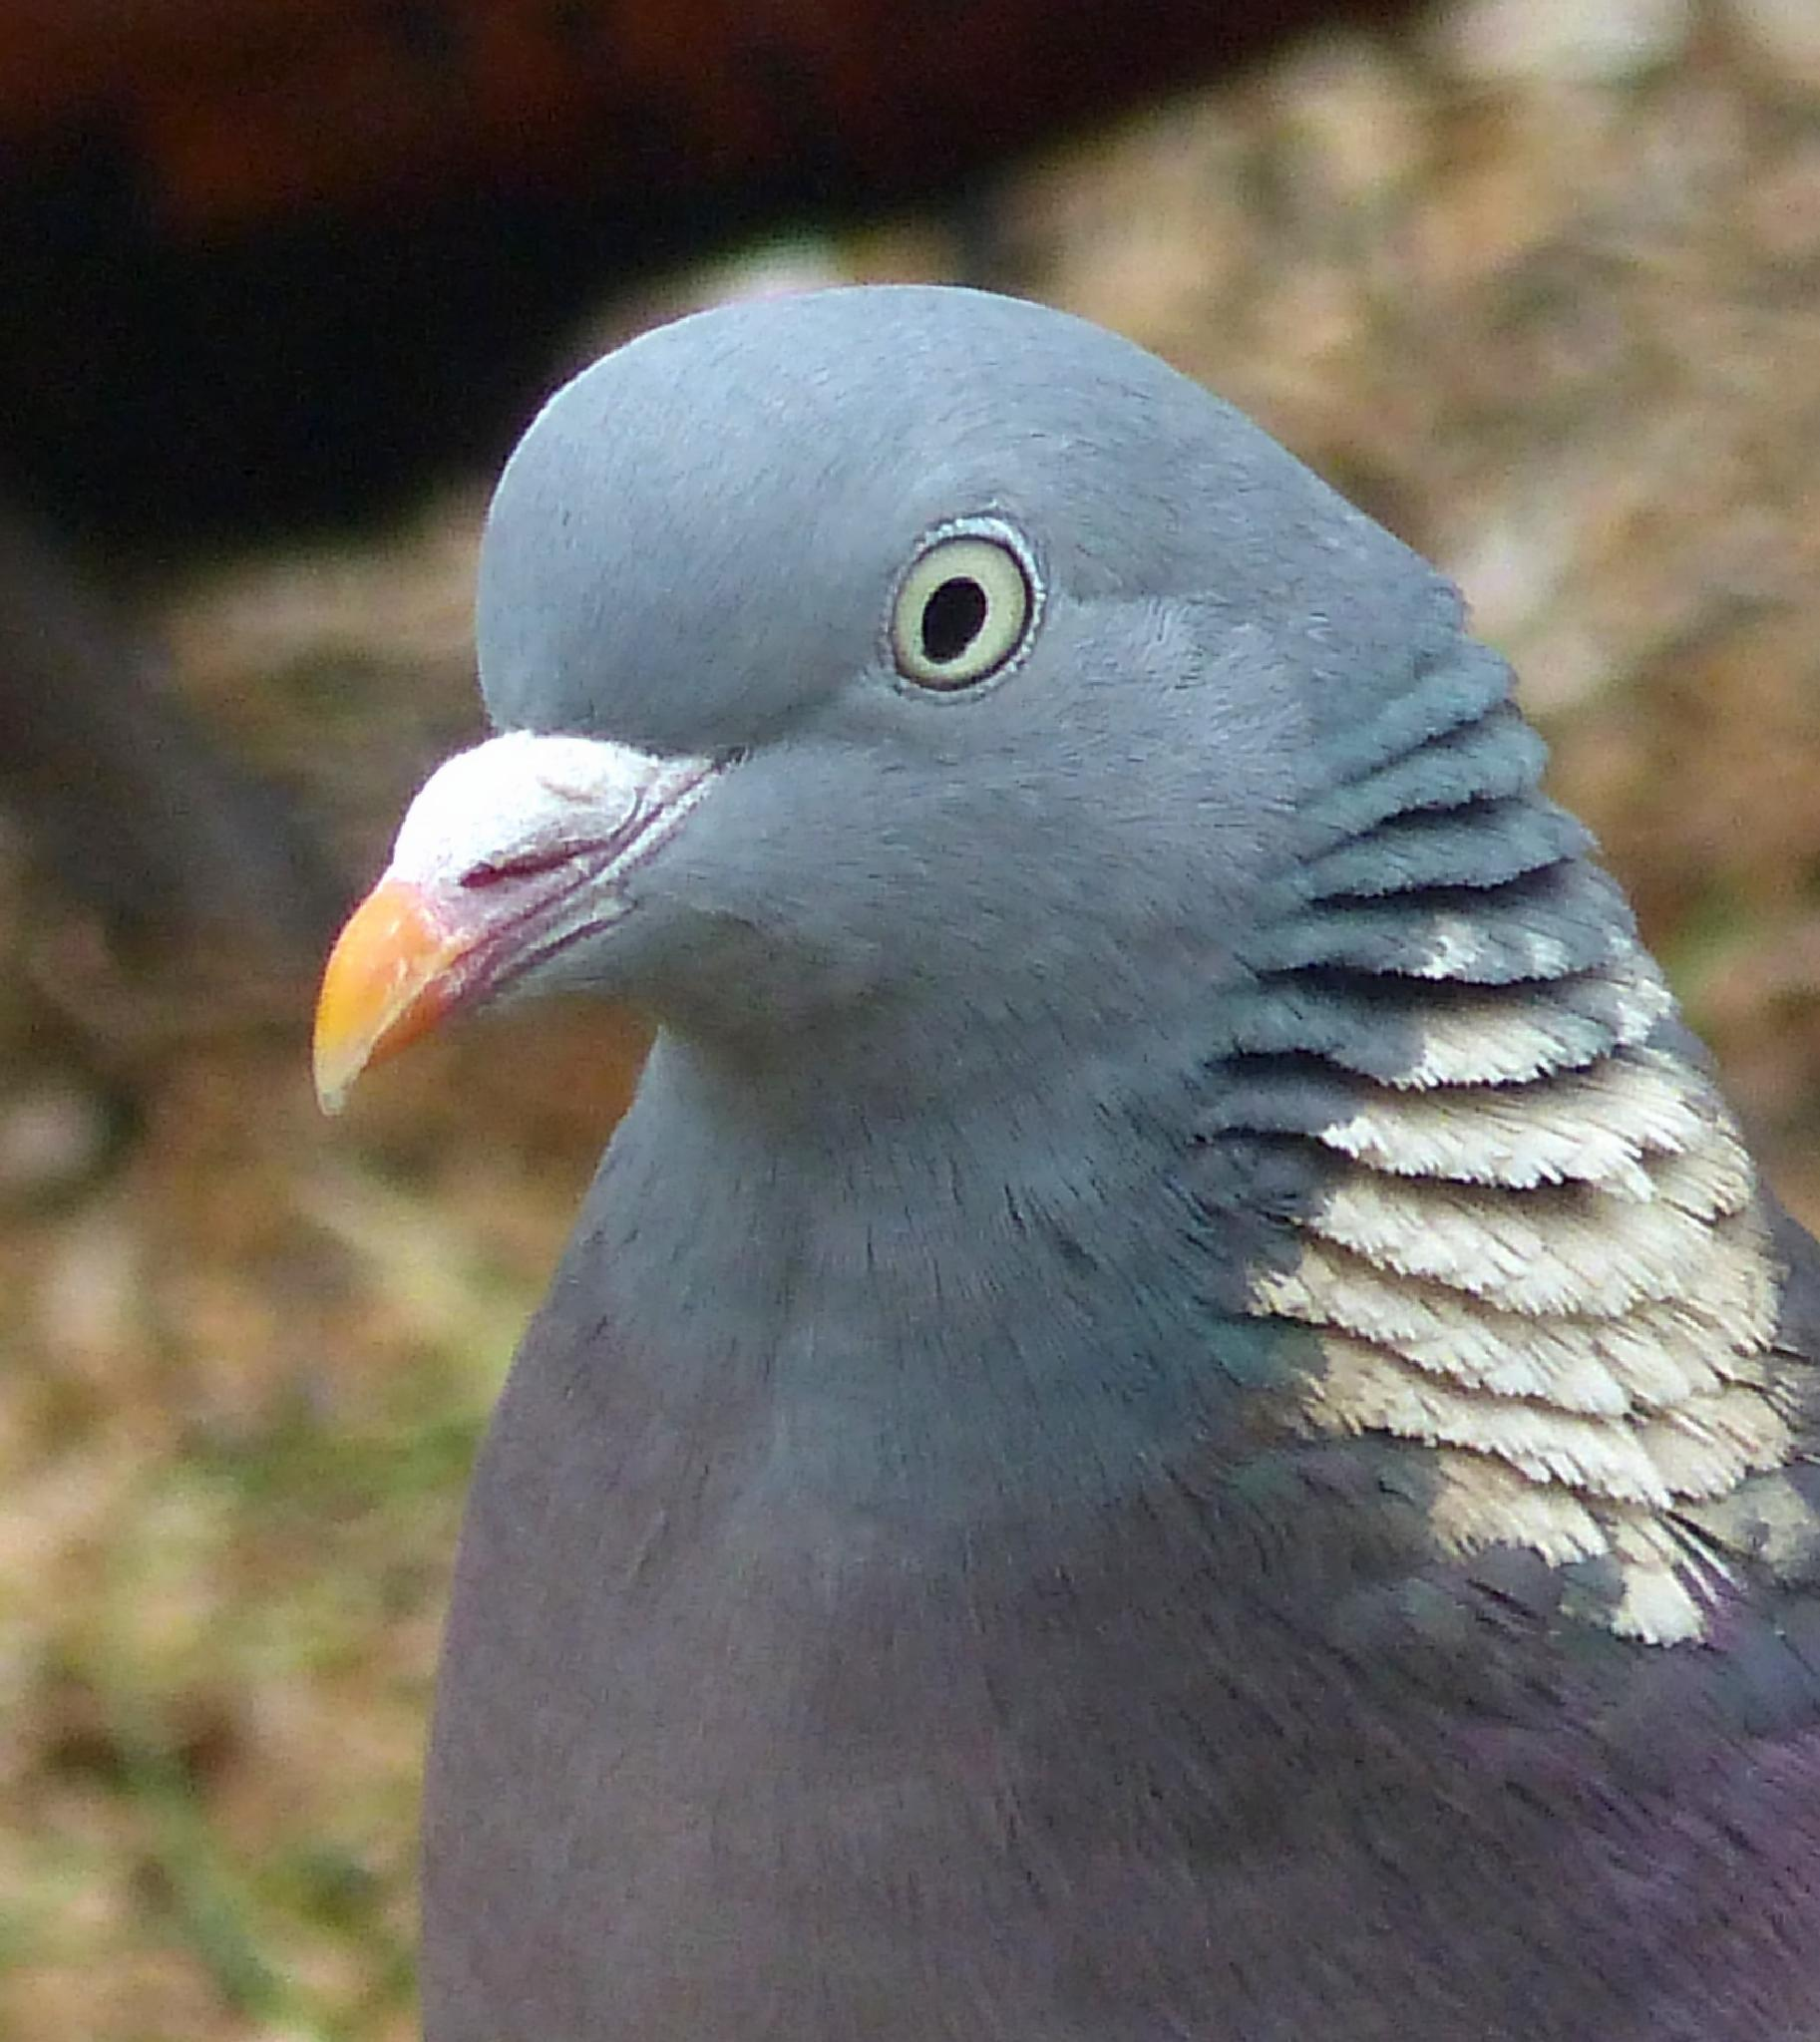 Pigeon up close by maja.e.olin